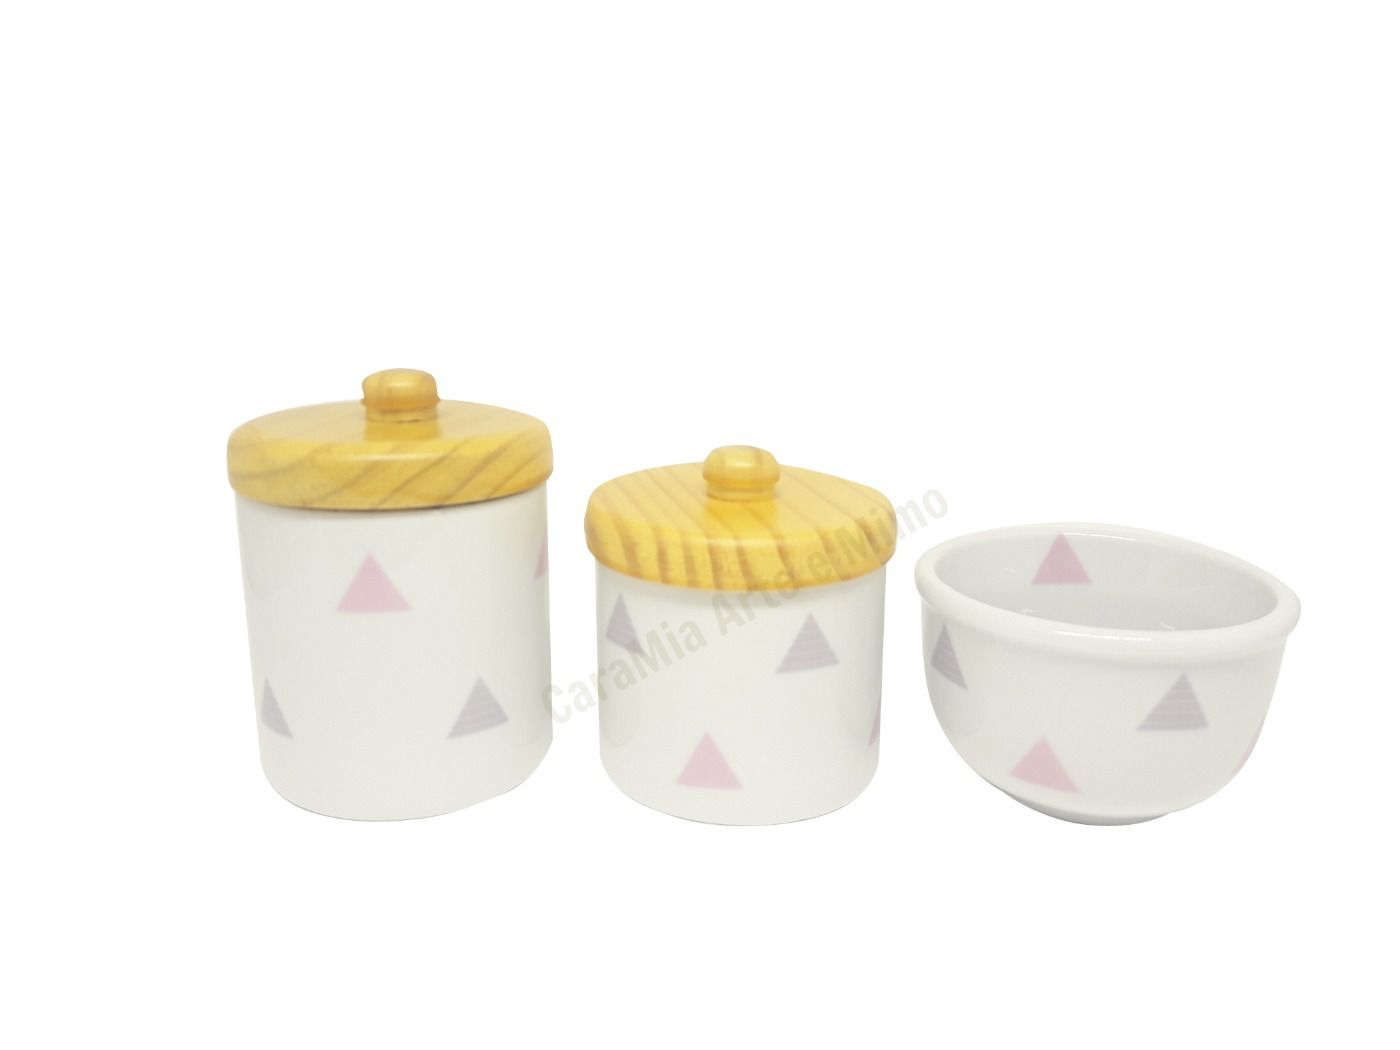 Kit Higiene Bebê Porcelana Bandeirinhas Rosas e Cinzas & Triângulos |Geométrico | Tampas Pinus